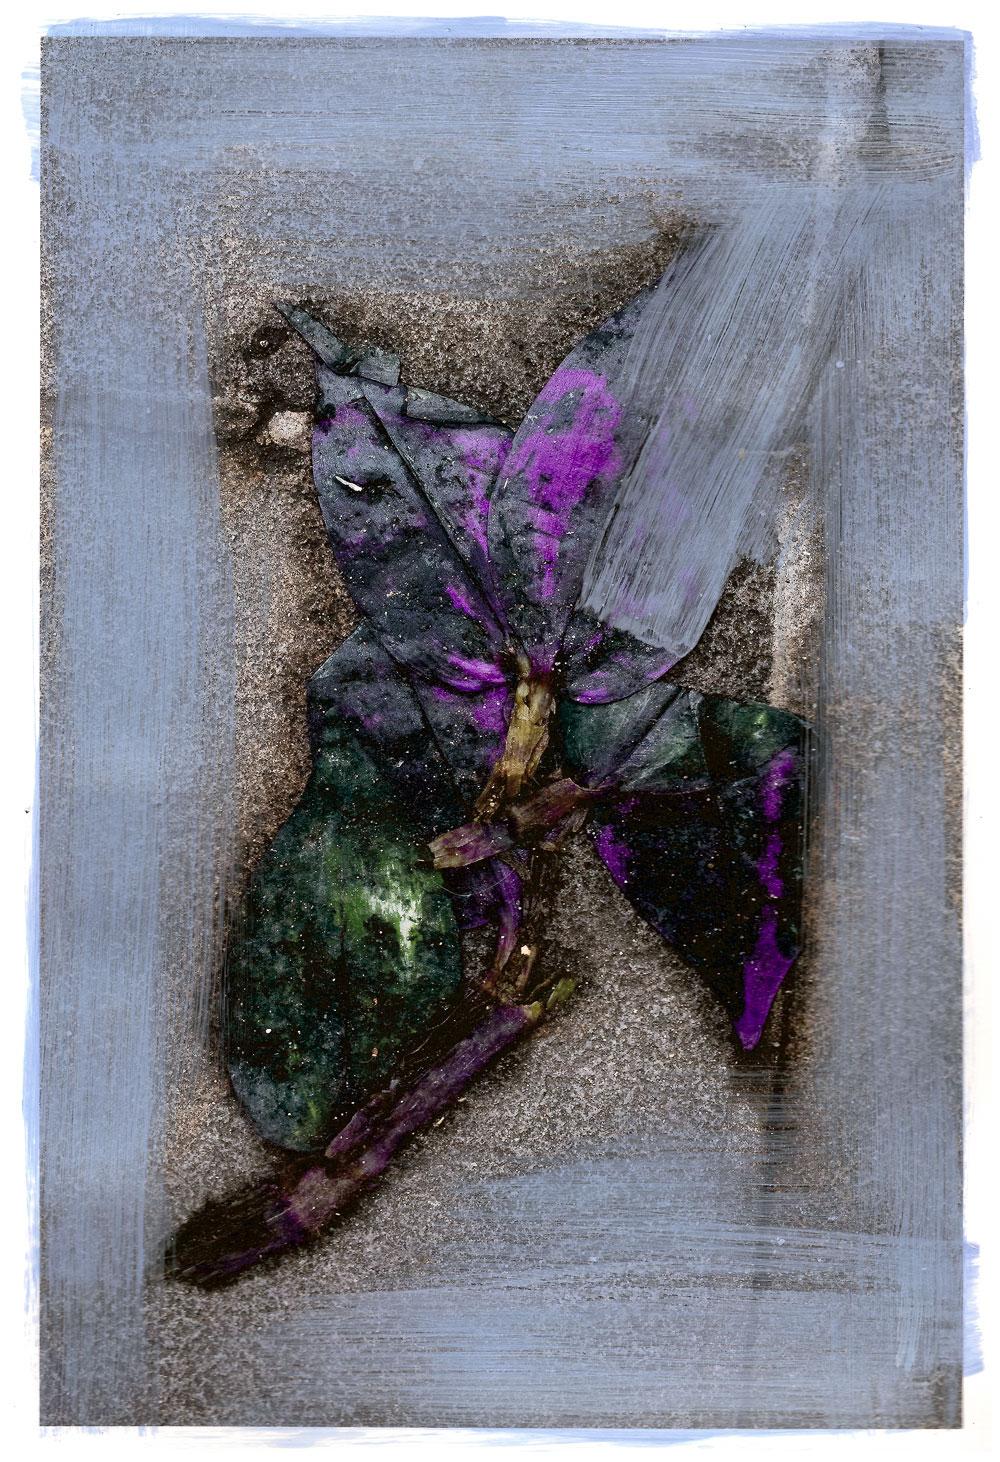 Melissa Spiccia | SEE FLOWERS IN HELL FALLEN PHOTOGRAPH MELISSA SPICCIA